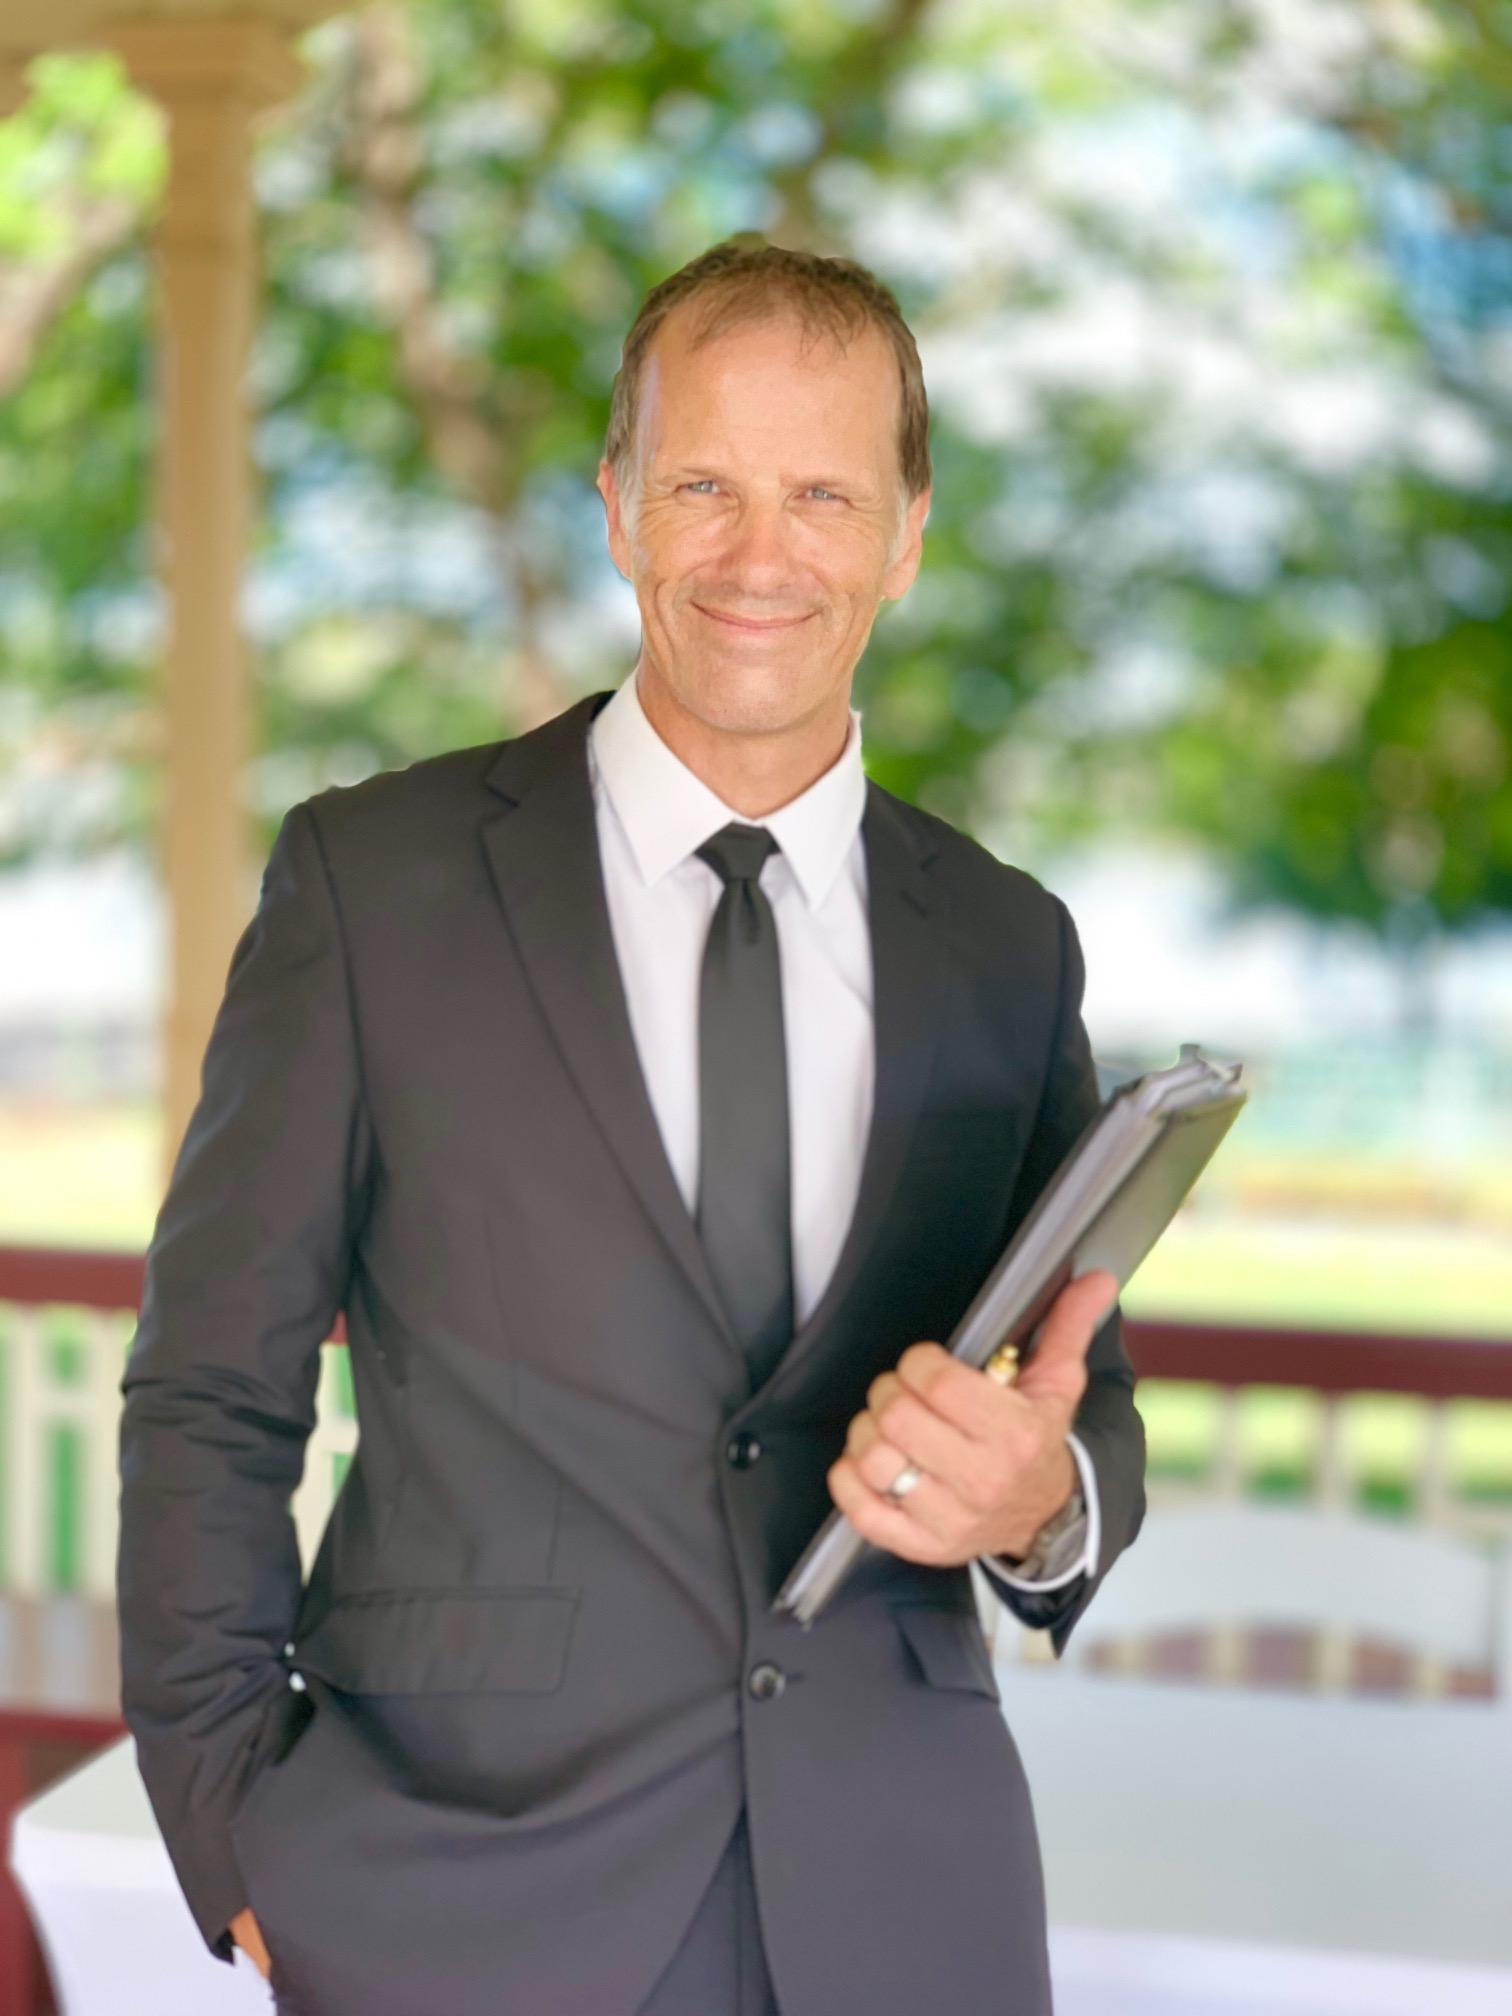 Brisbane Marriage Celebrant Jamie Eastgate